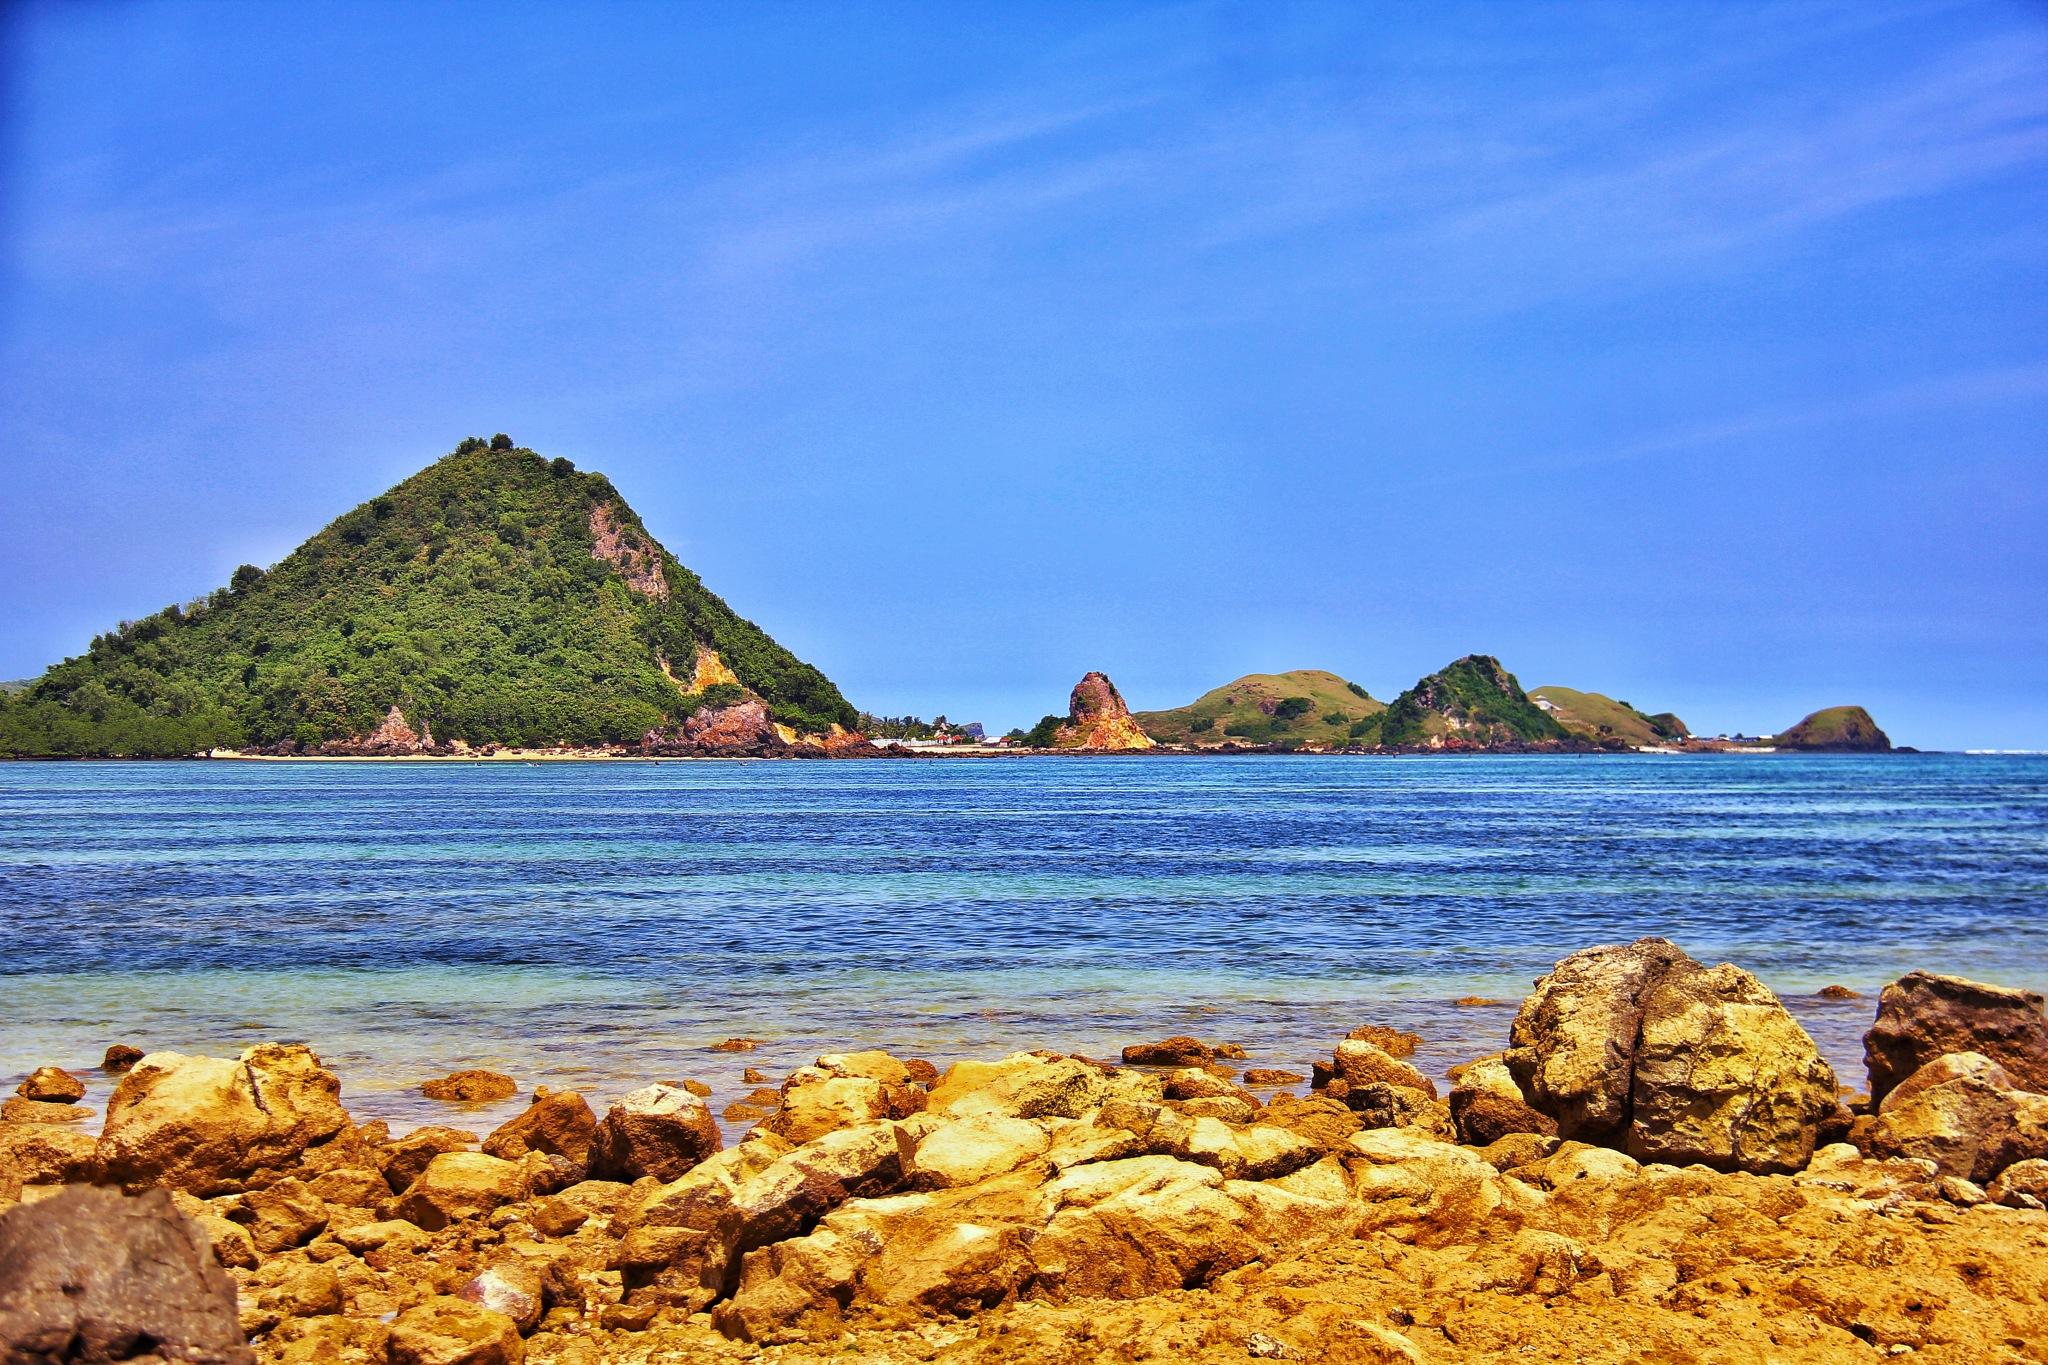 kute beach ,Lombok by Mutiara